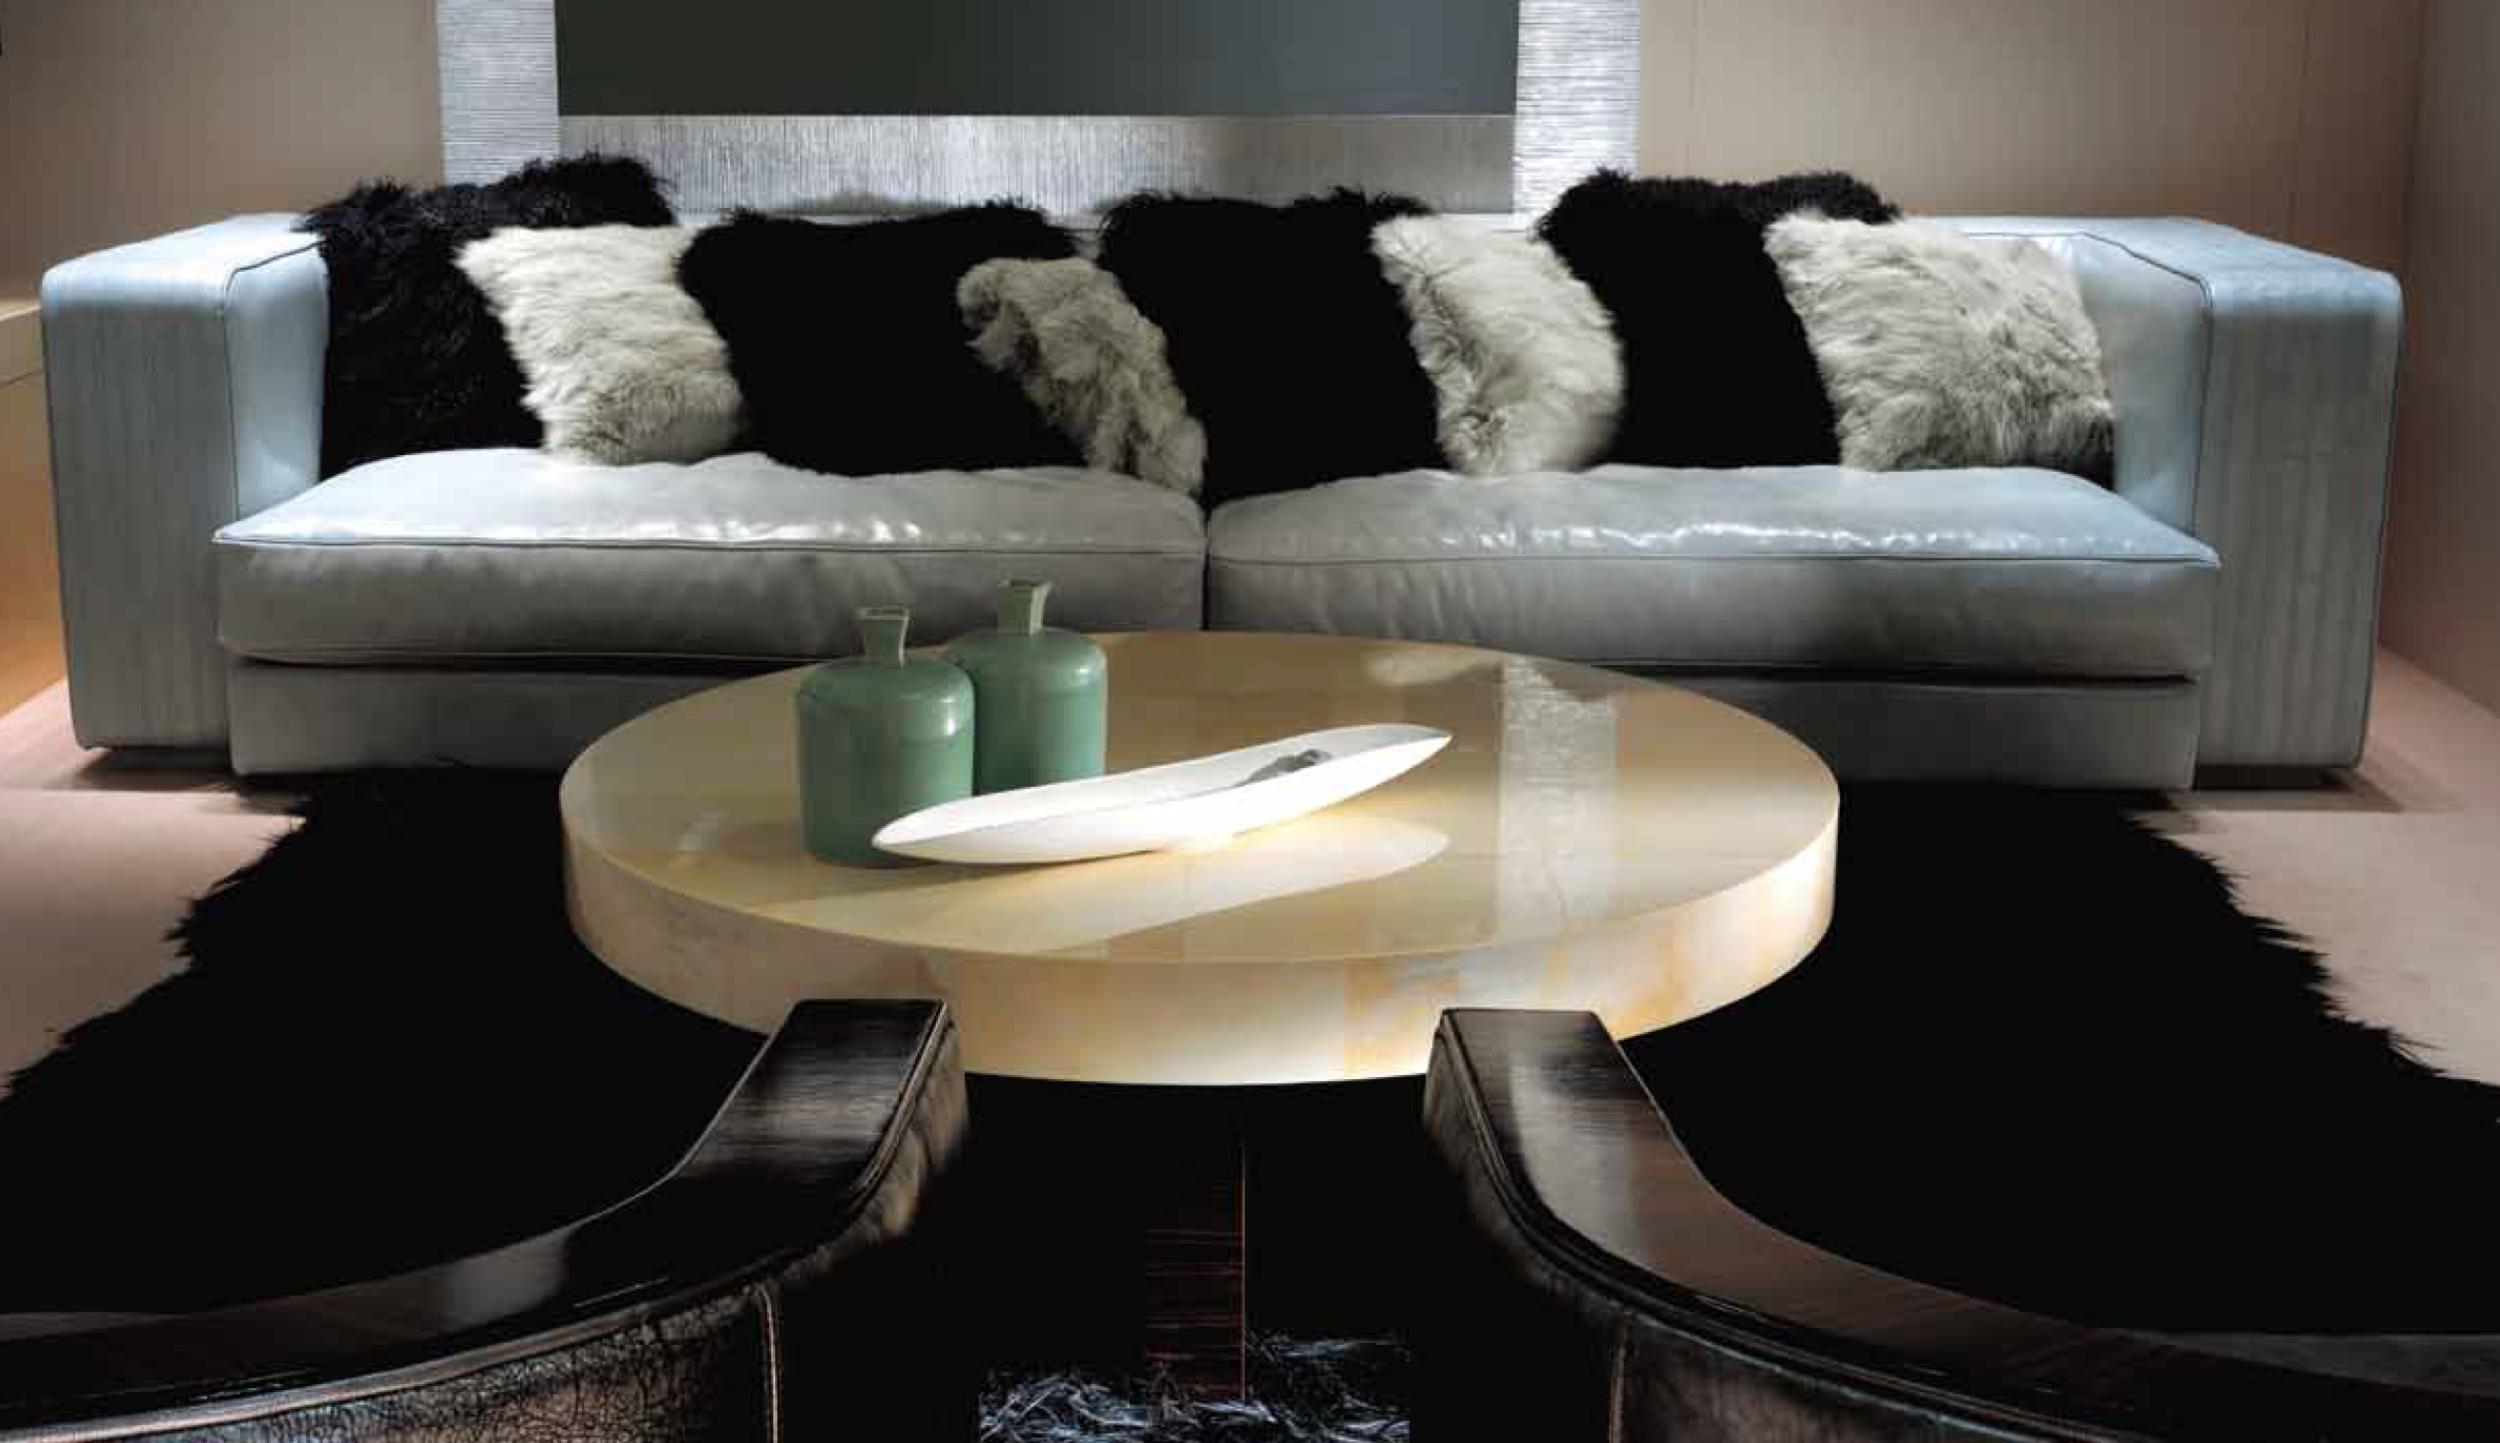 Ulivi Salotti Ritz sofa - An Ode to Leather @ Masha Shapiro Agency.jpg